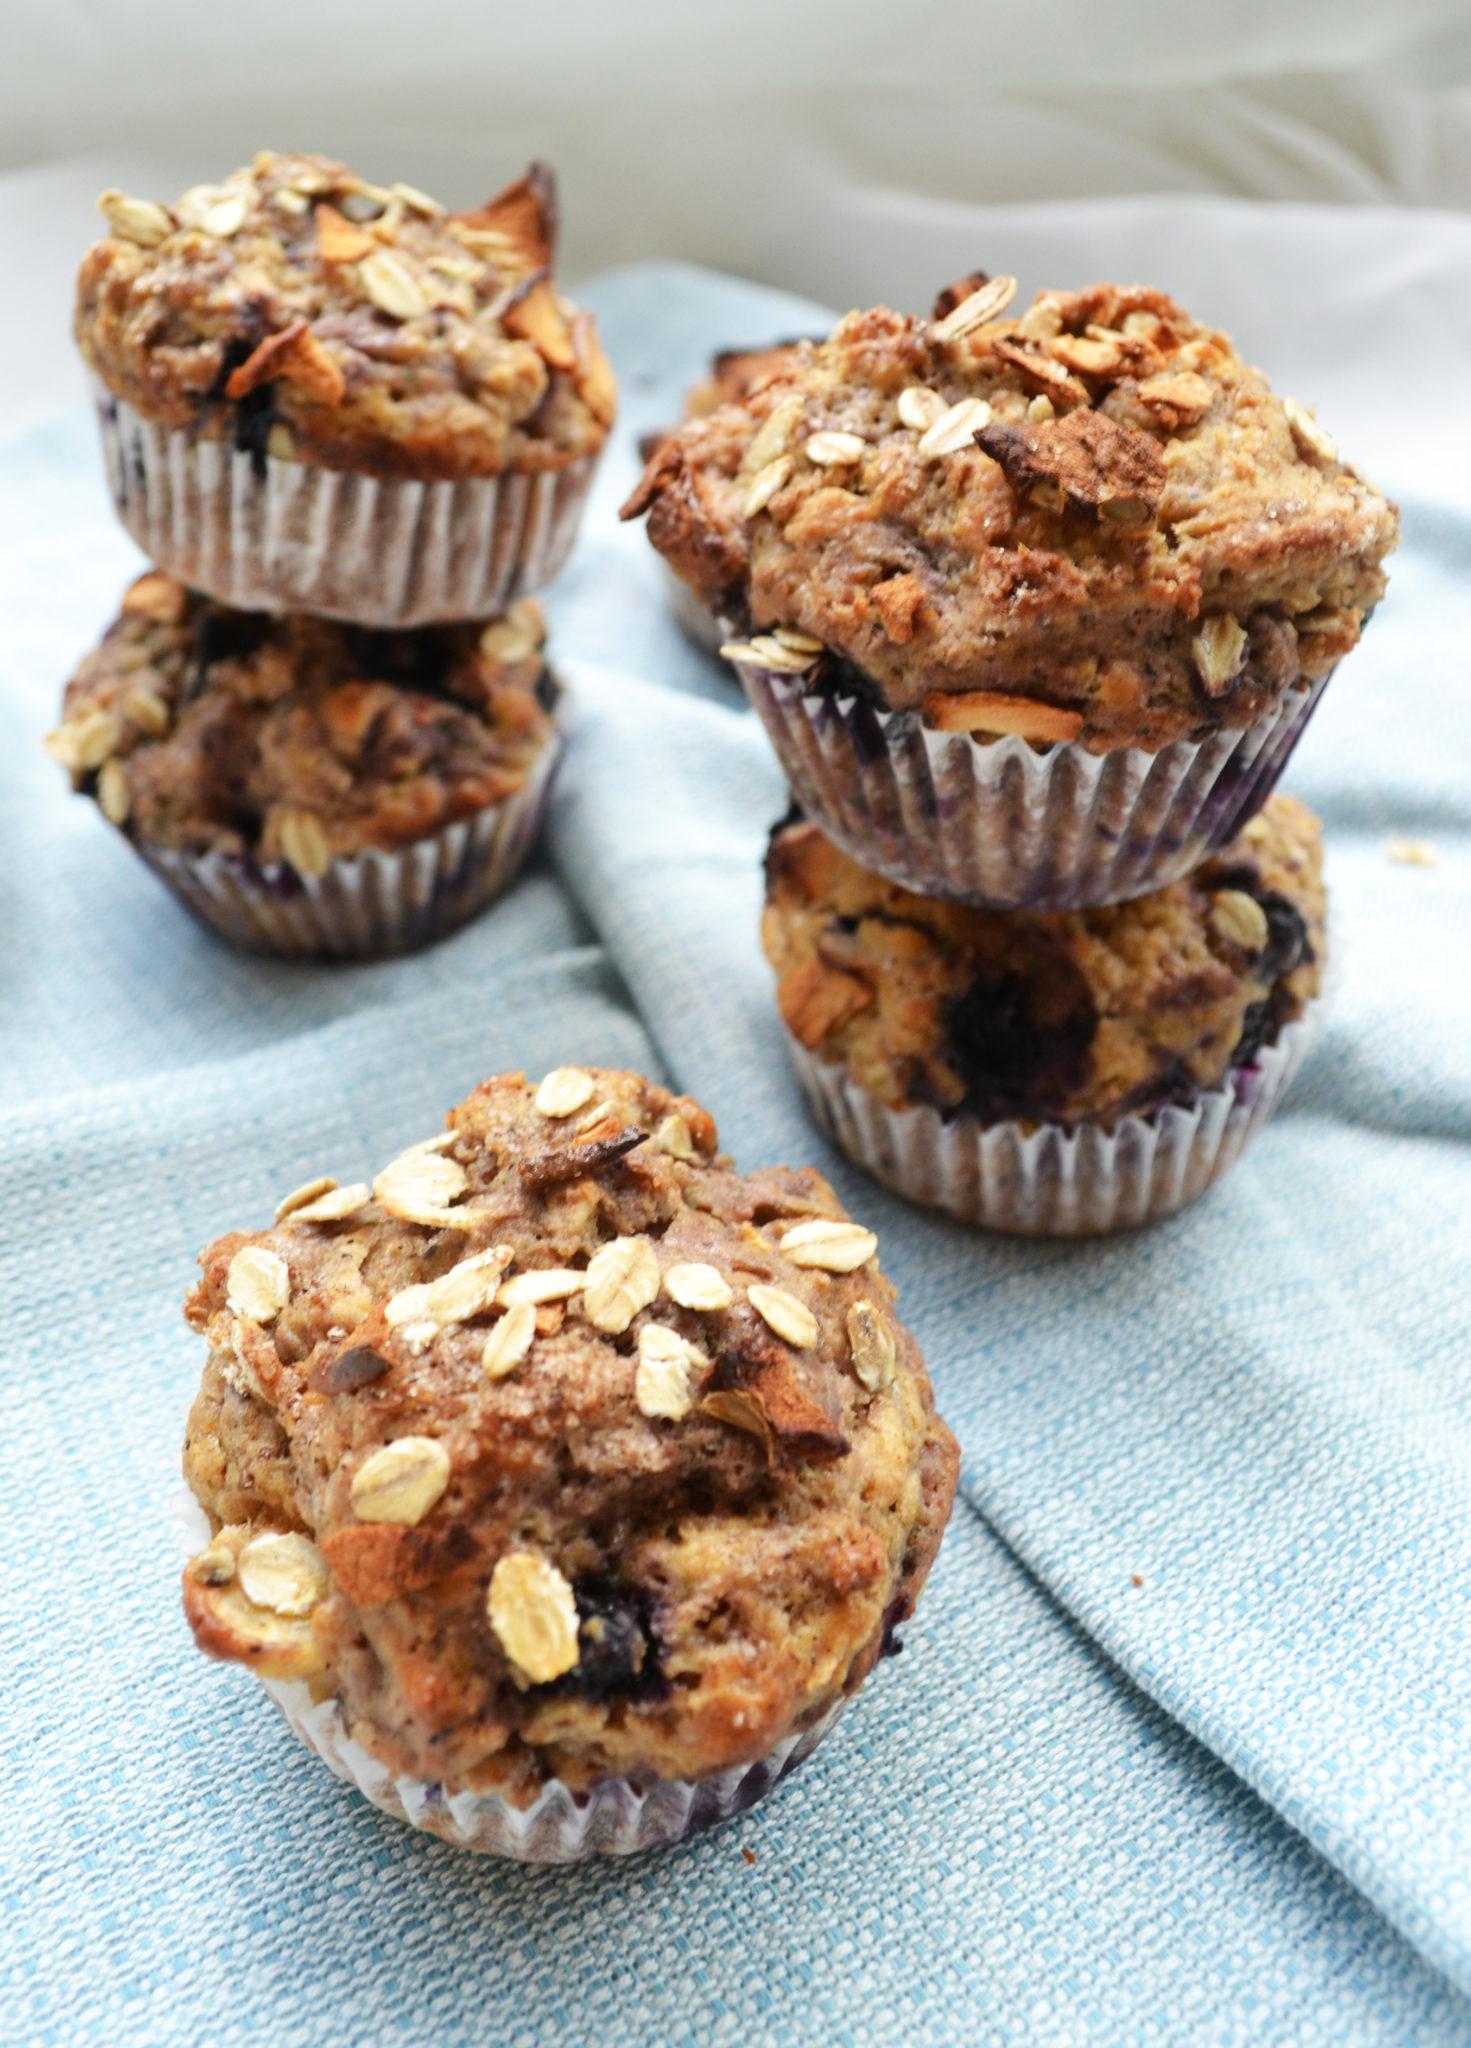 Frühstücksglück! Gesunde Heidelbeer-Apfel-Muffins